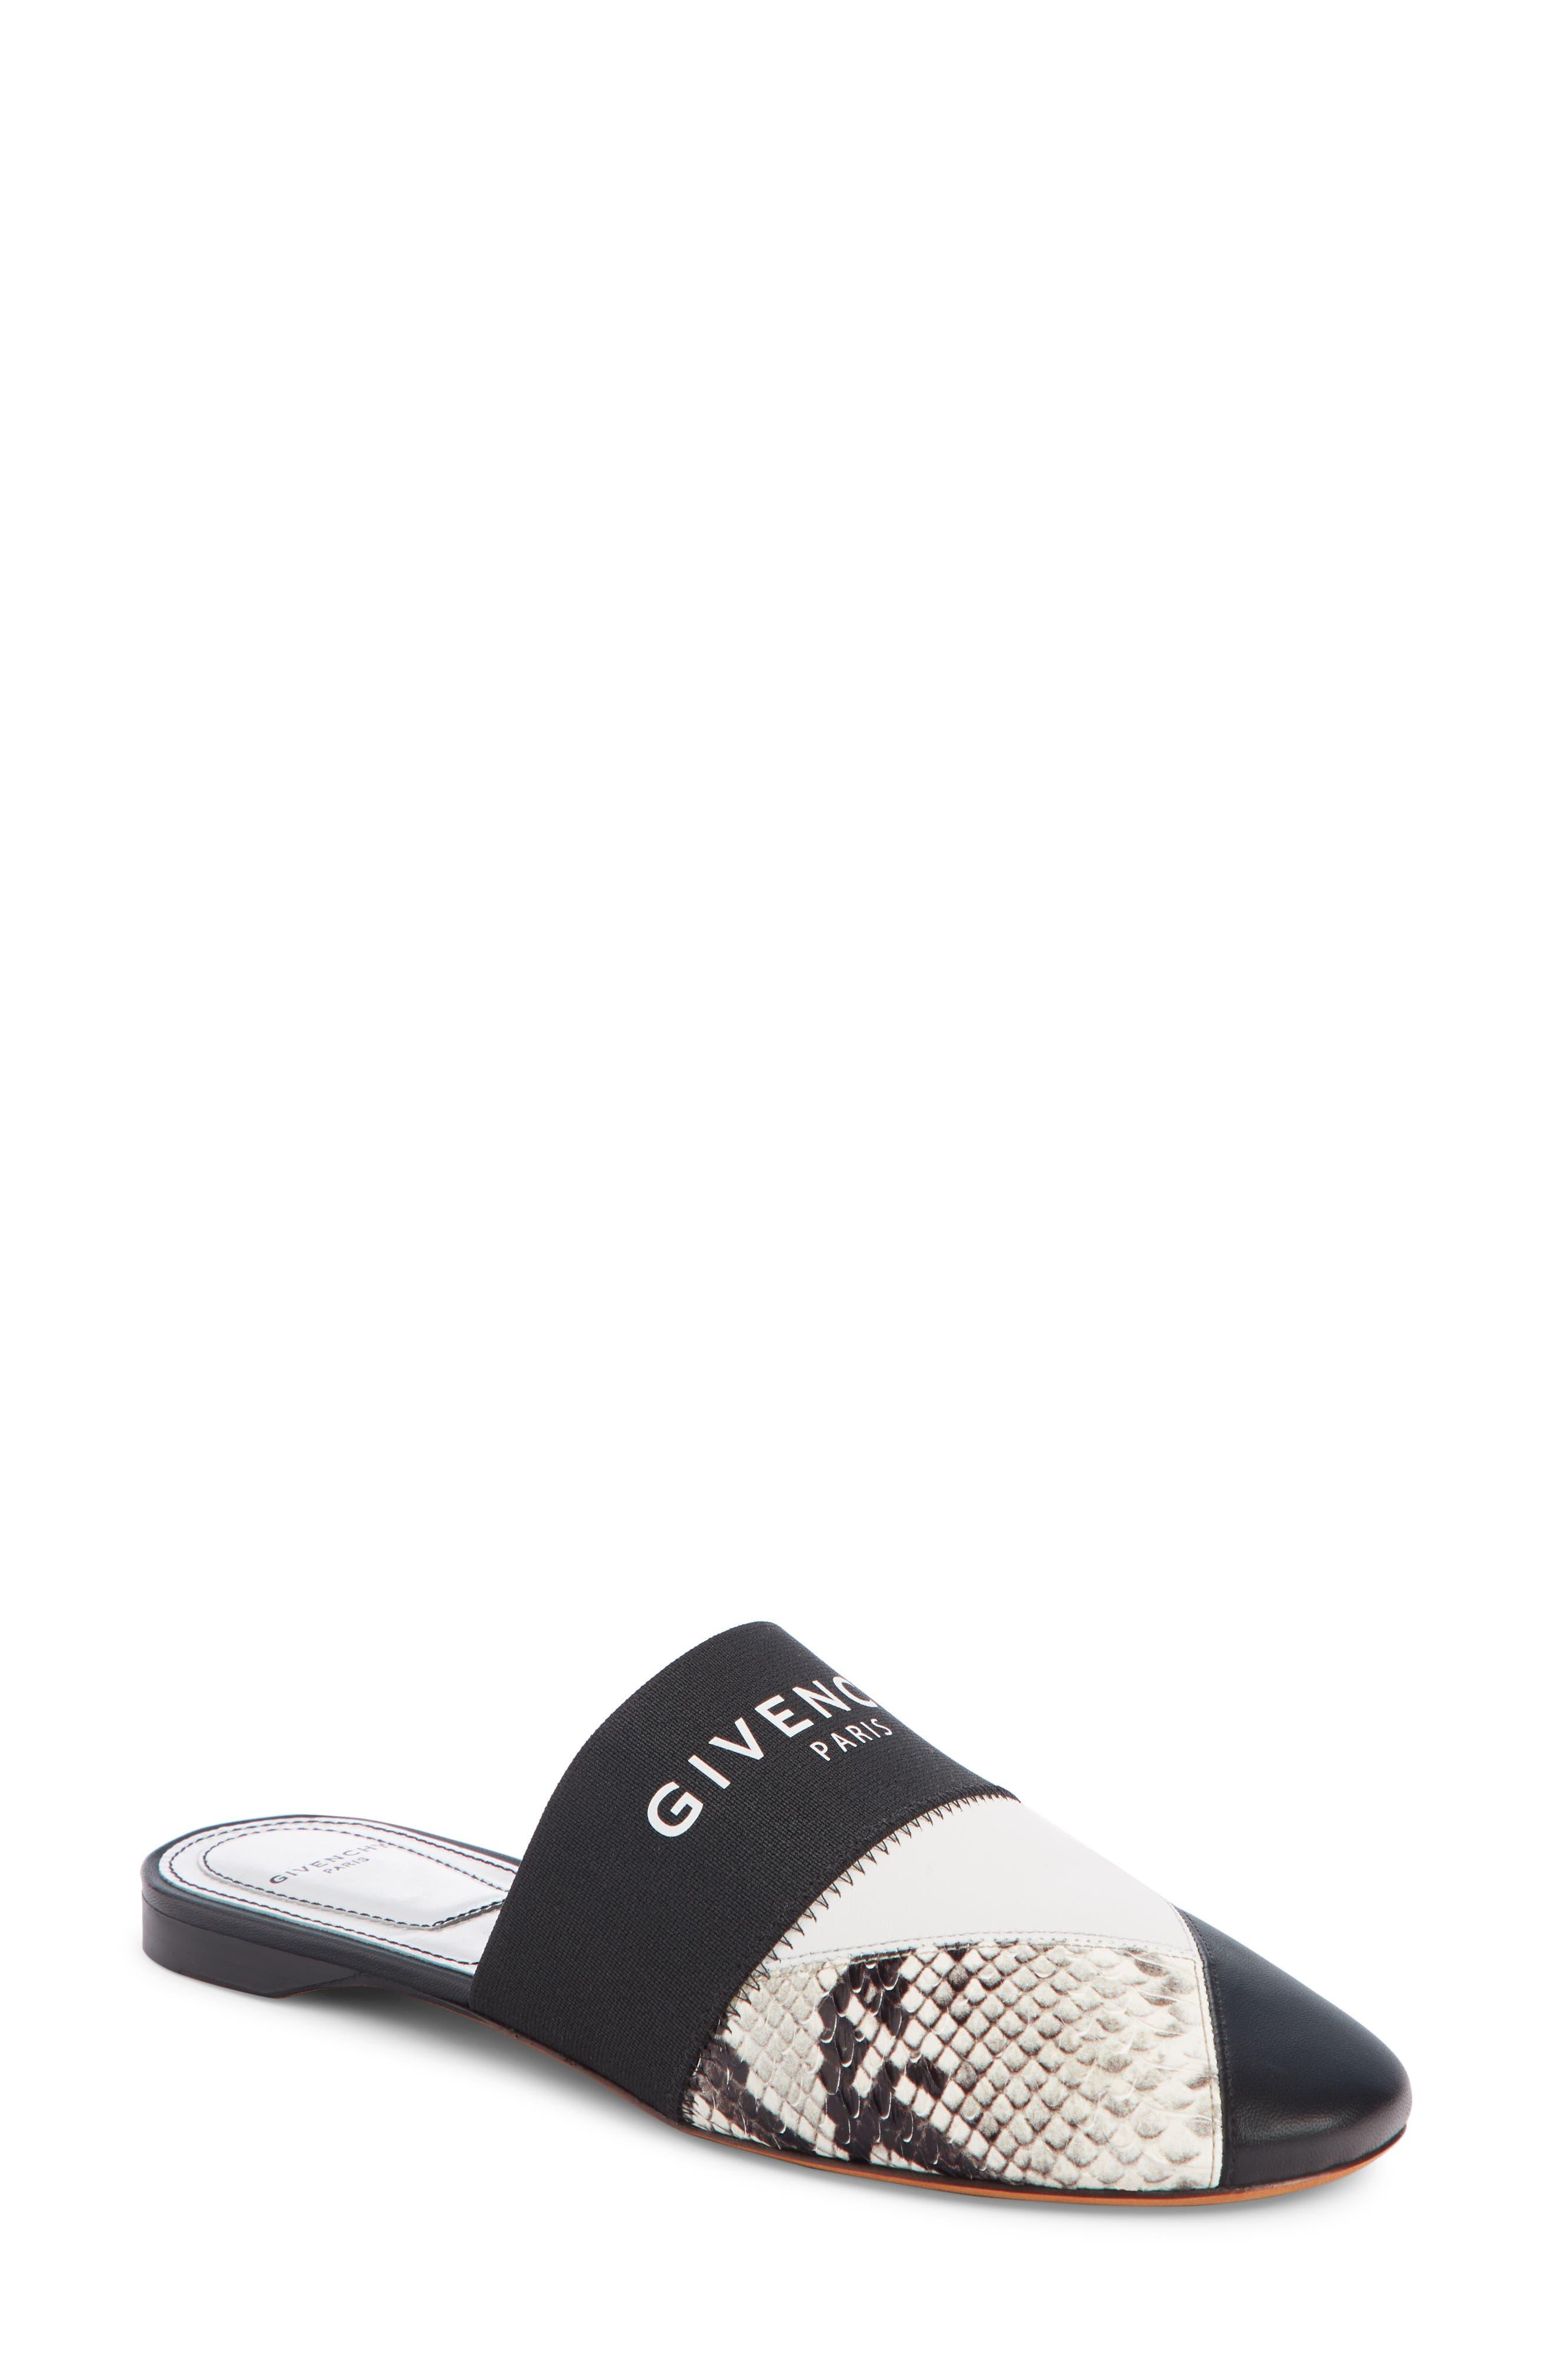 Givenchy Patchwork Logo Mule, Black